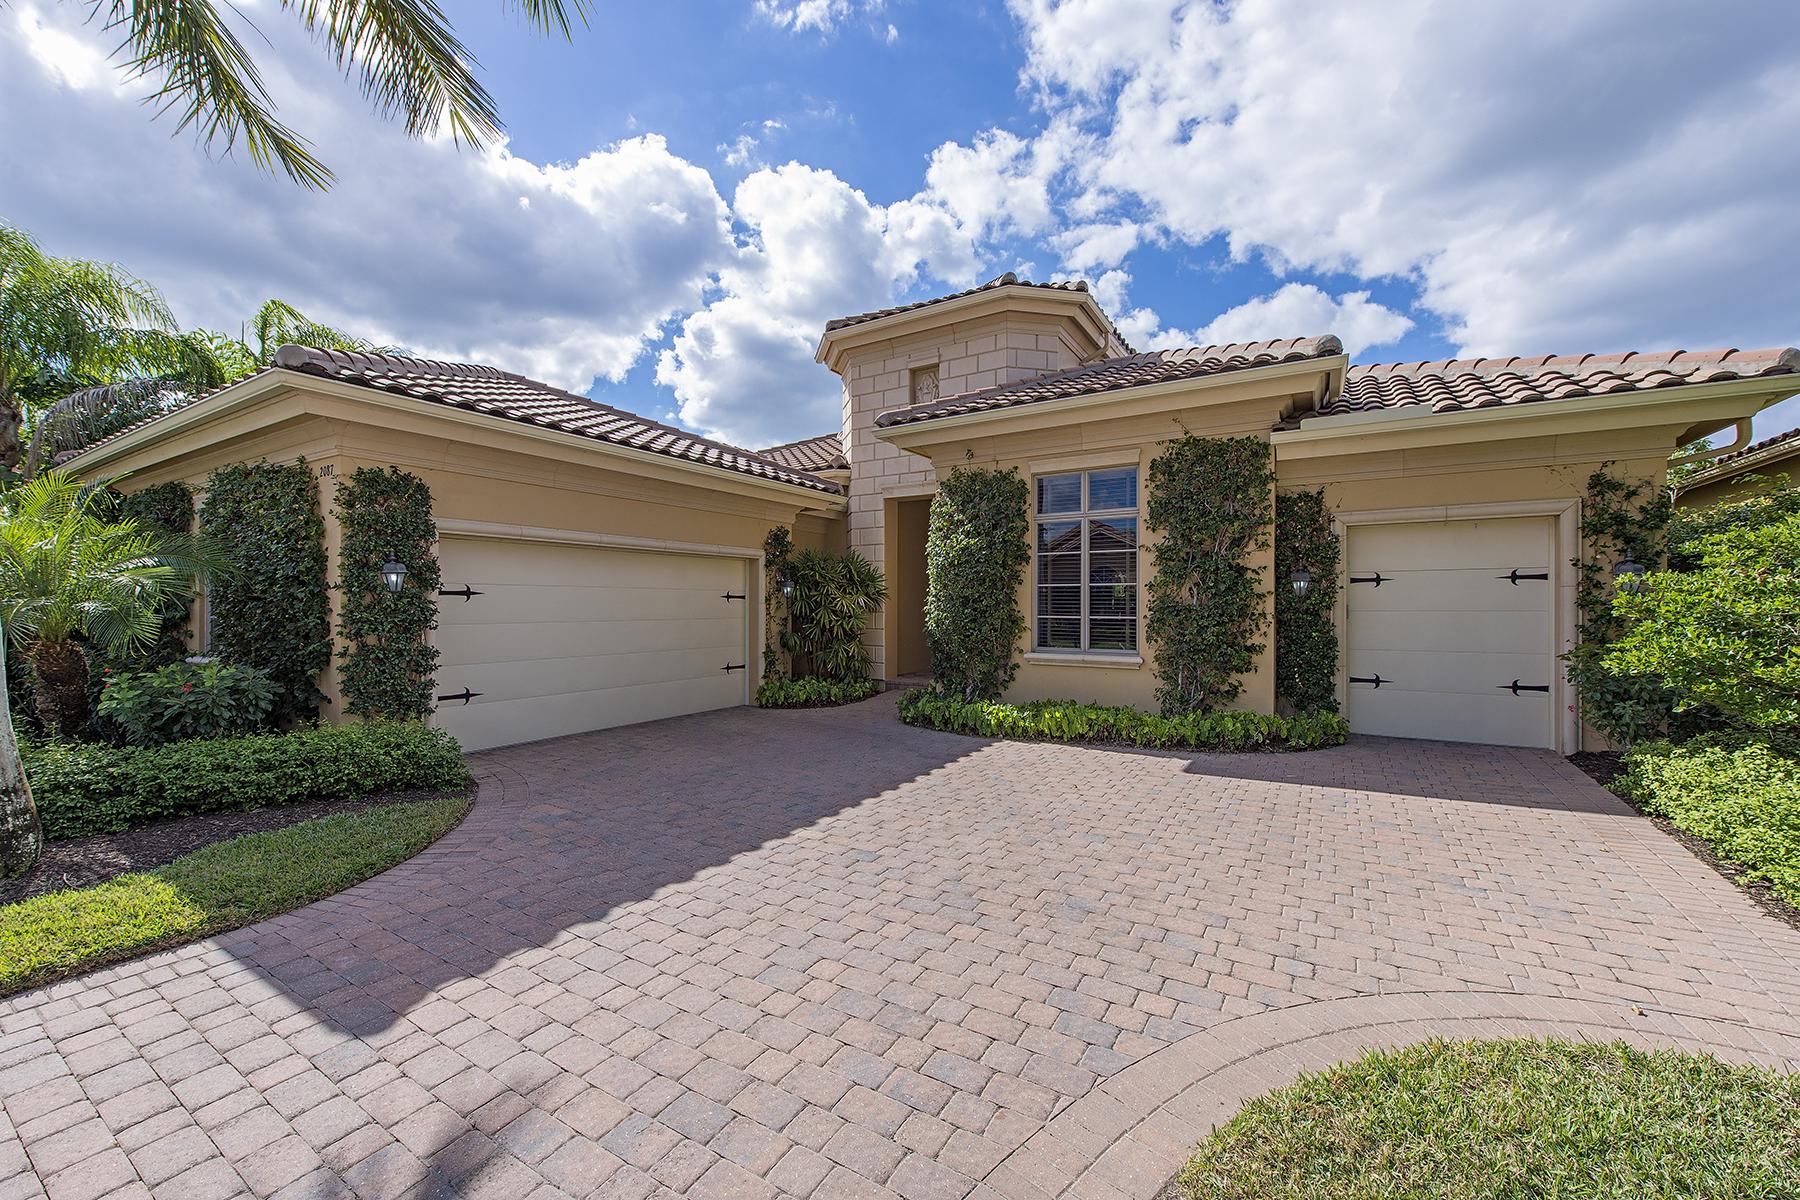 Single Family Home for Sale at GREY OAKS - TORINO 2087 Rivoli Ct Naples, Florida, 34105 United States